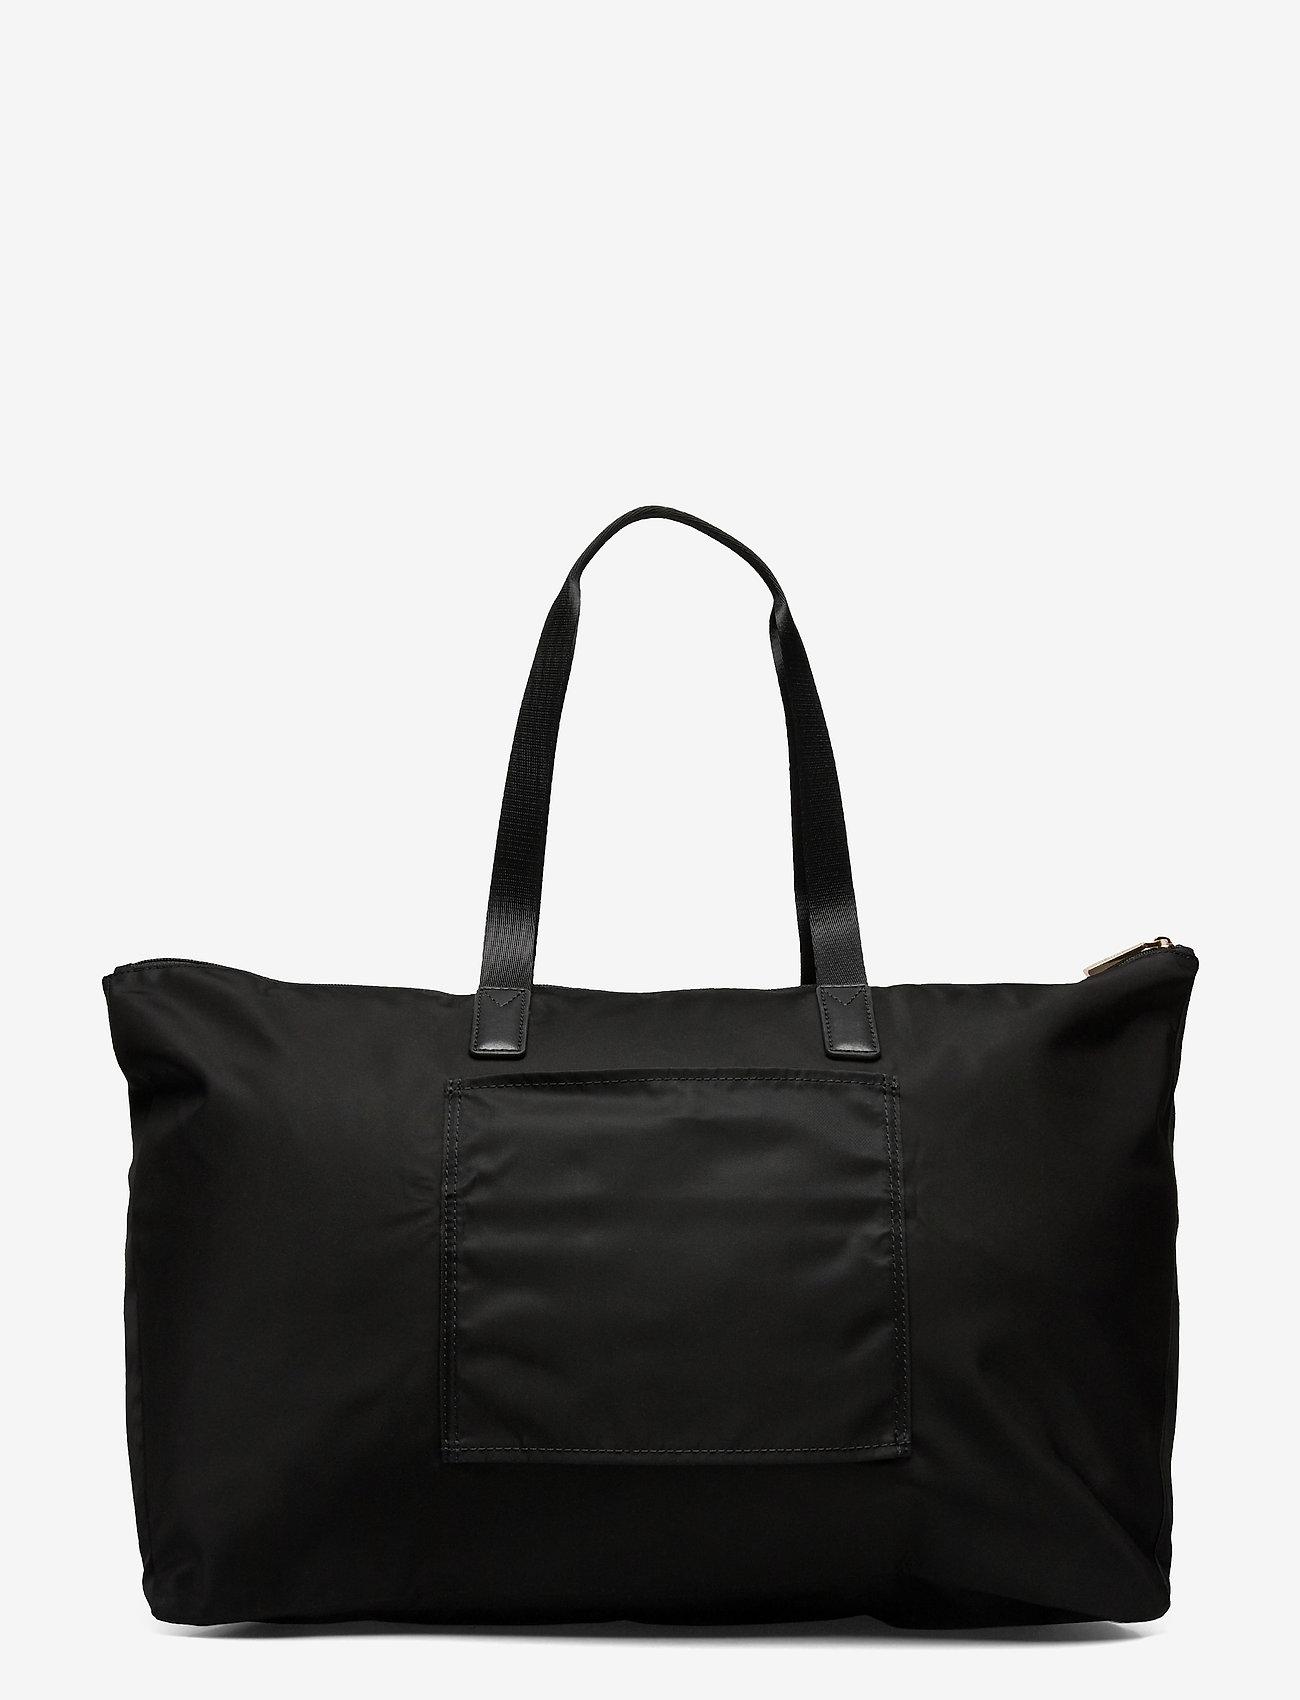 Michael Kors - LG PACKABLE TOTE - tote bags - black - 1